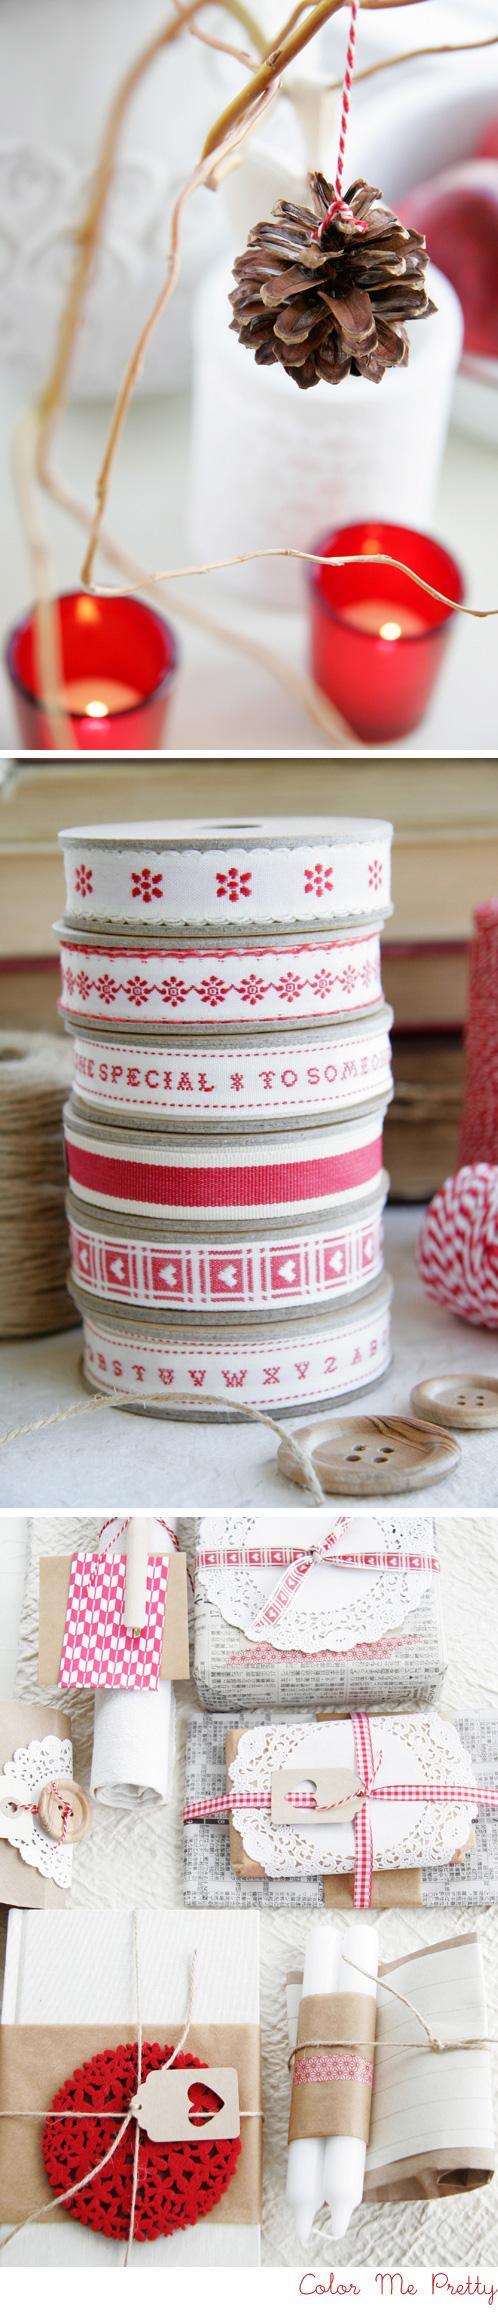 Diy Wedding Gift Wrap : diy-christmas-gift-wrapping-ideas-handmade-and-easy-wedding-gift-wrap ...